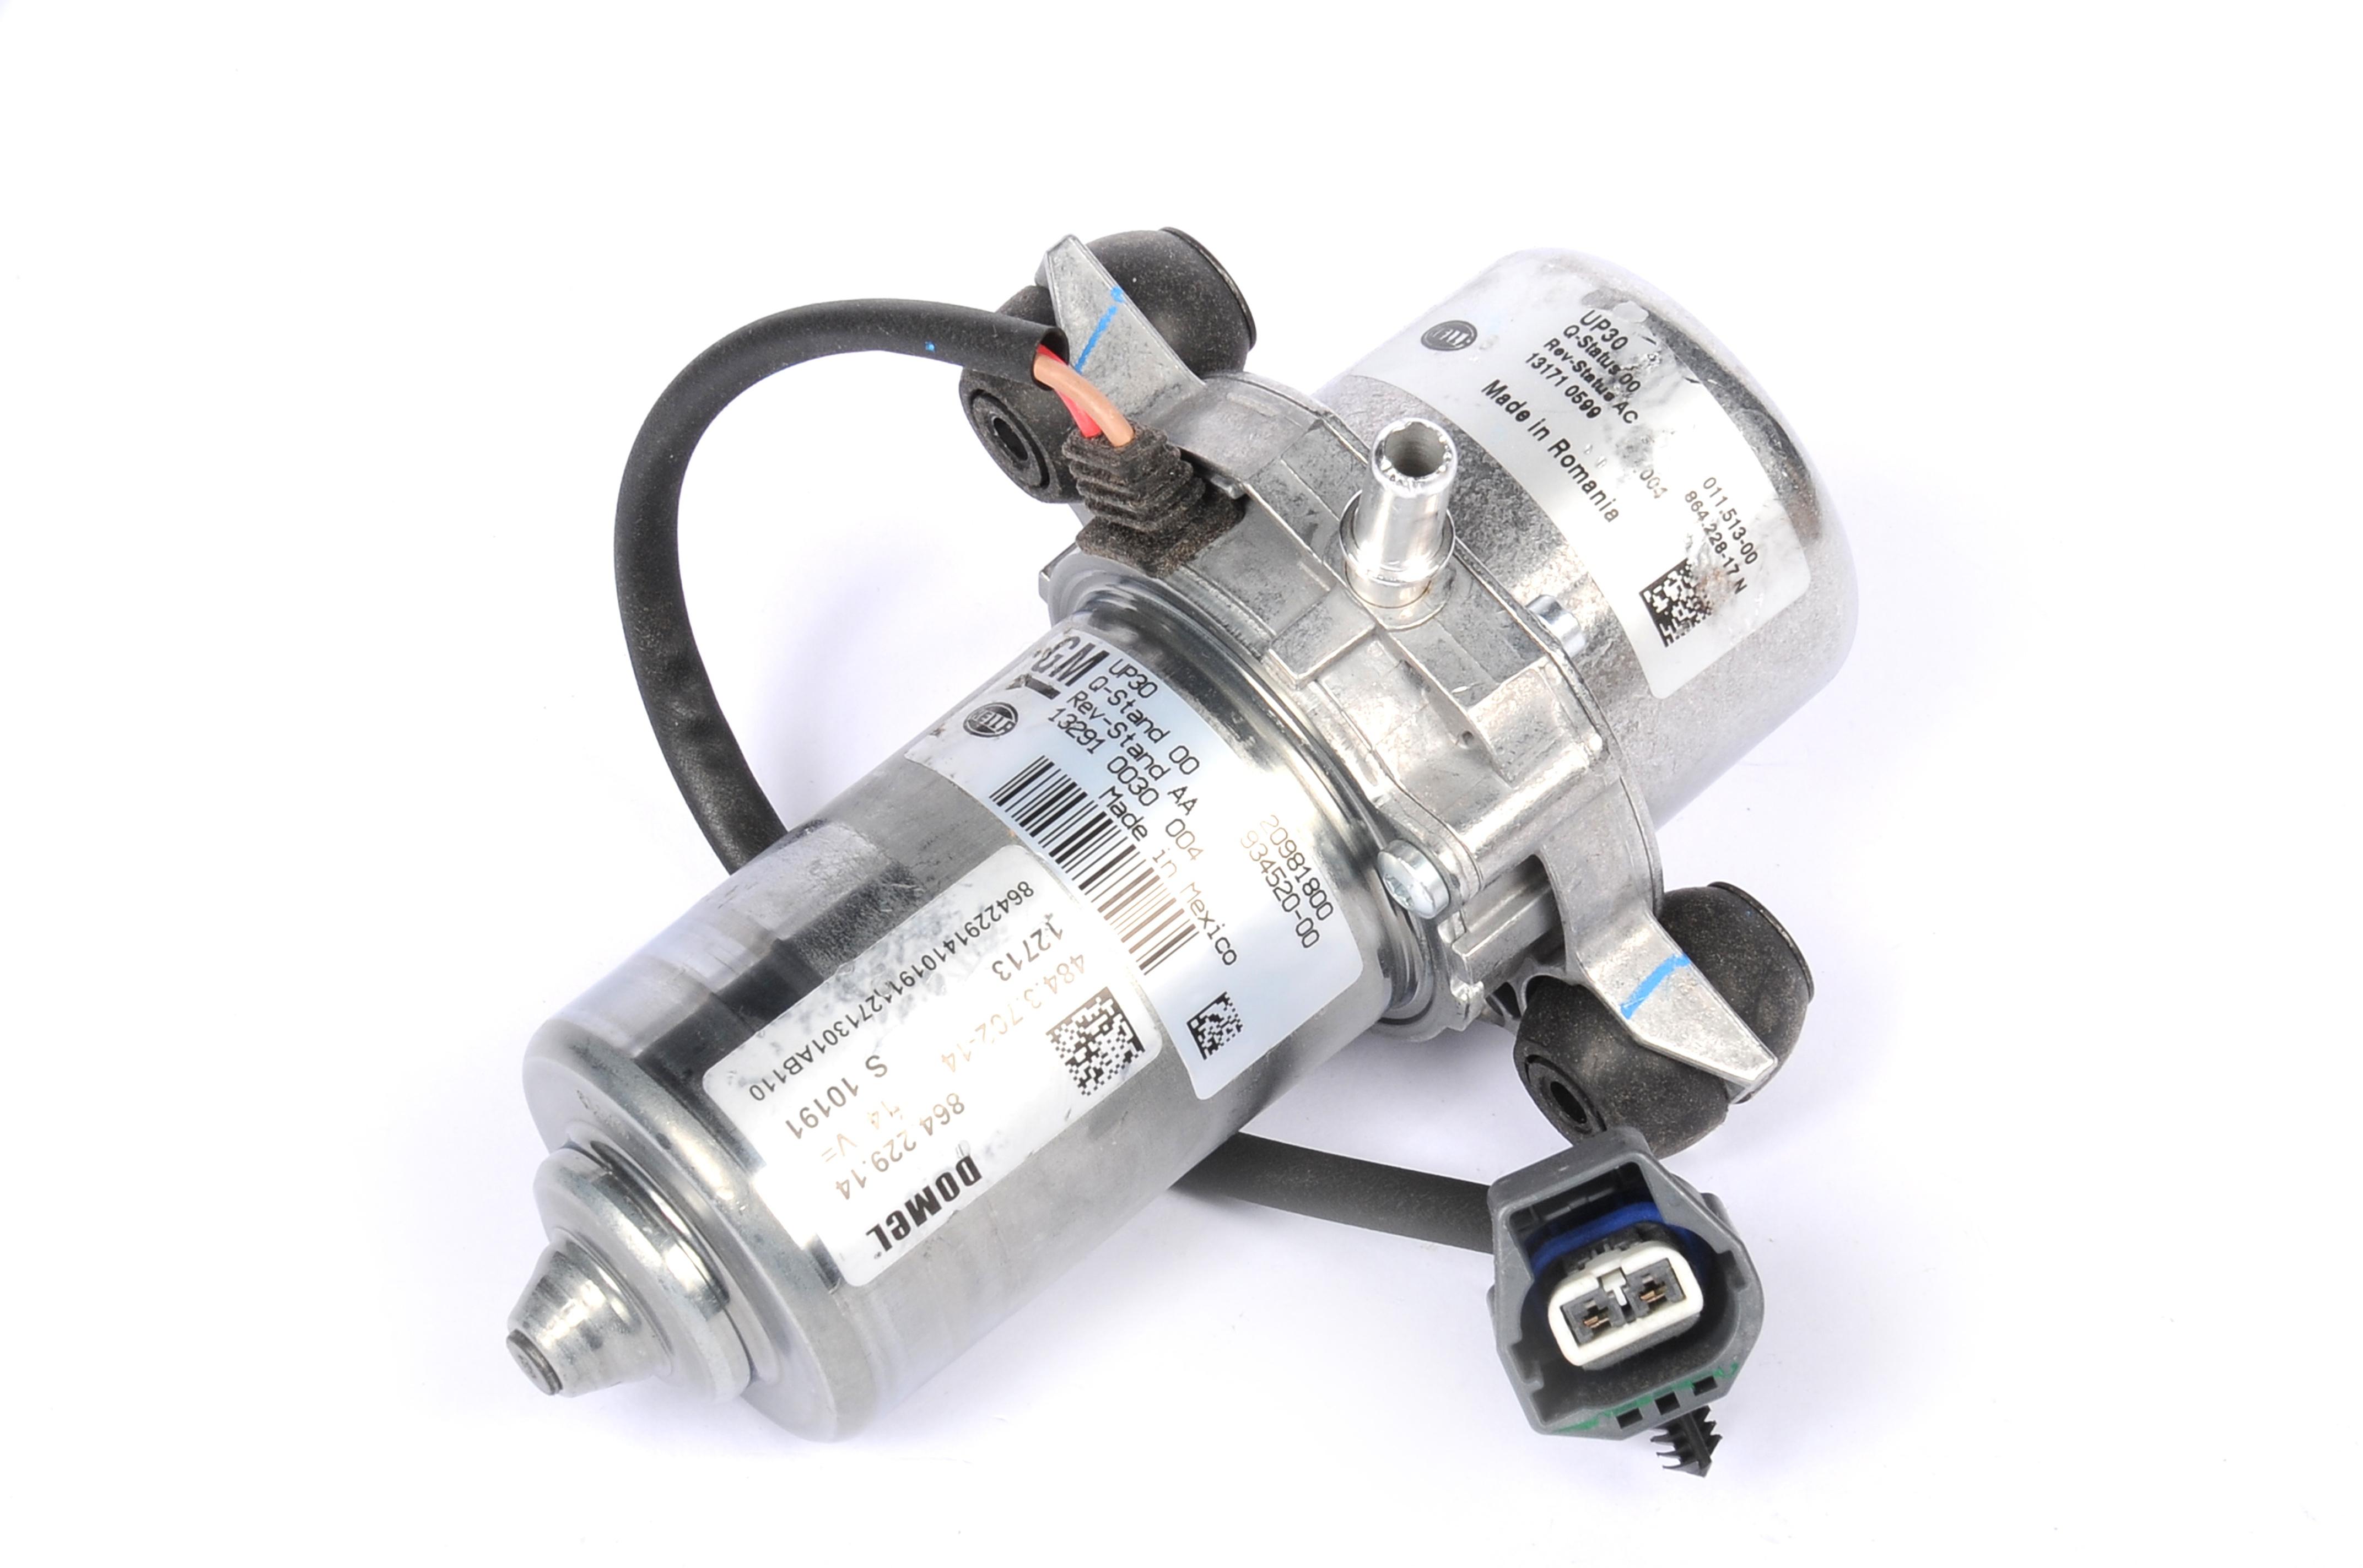 ACDELCO GM ORIGINAL EQUIPMENT - Power Brake Booster Hydraulic Motor Pump - DCB 178-0913